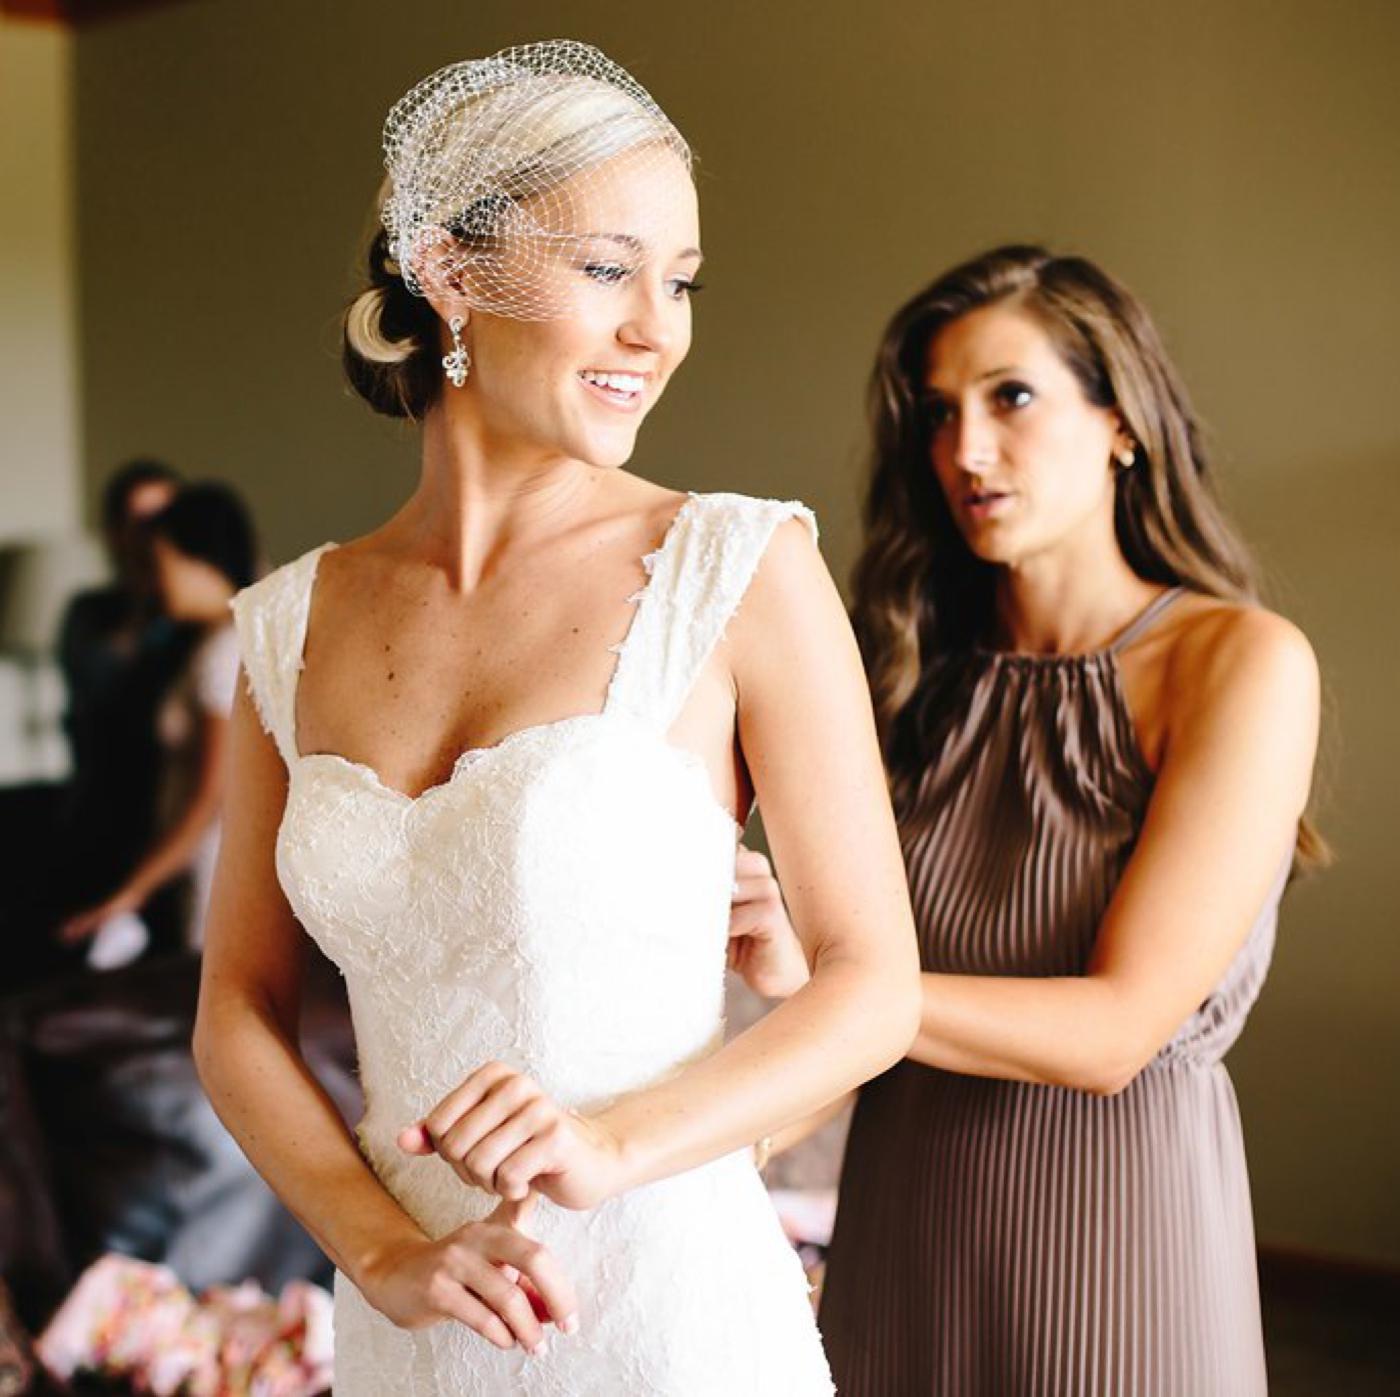 chicago-fine-art-wedding-photography-saylor11